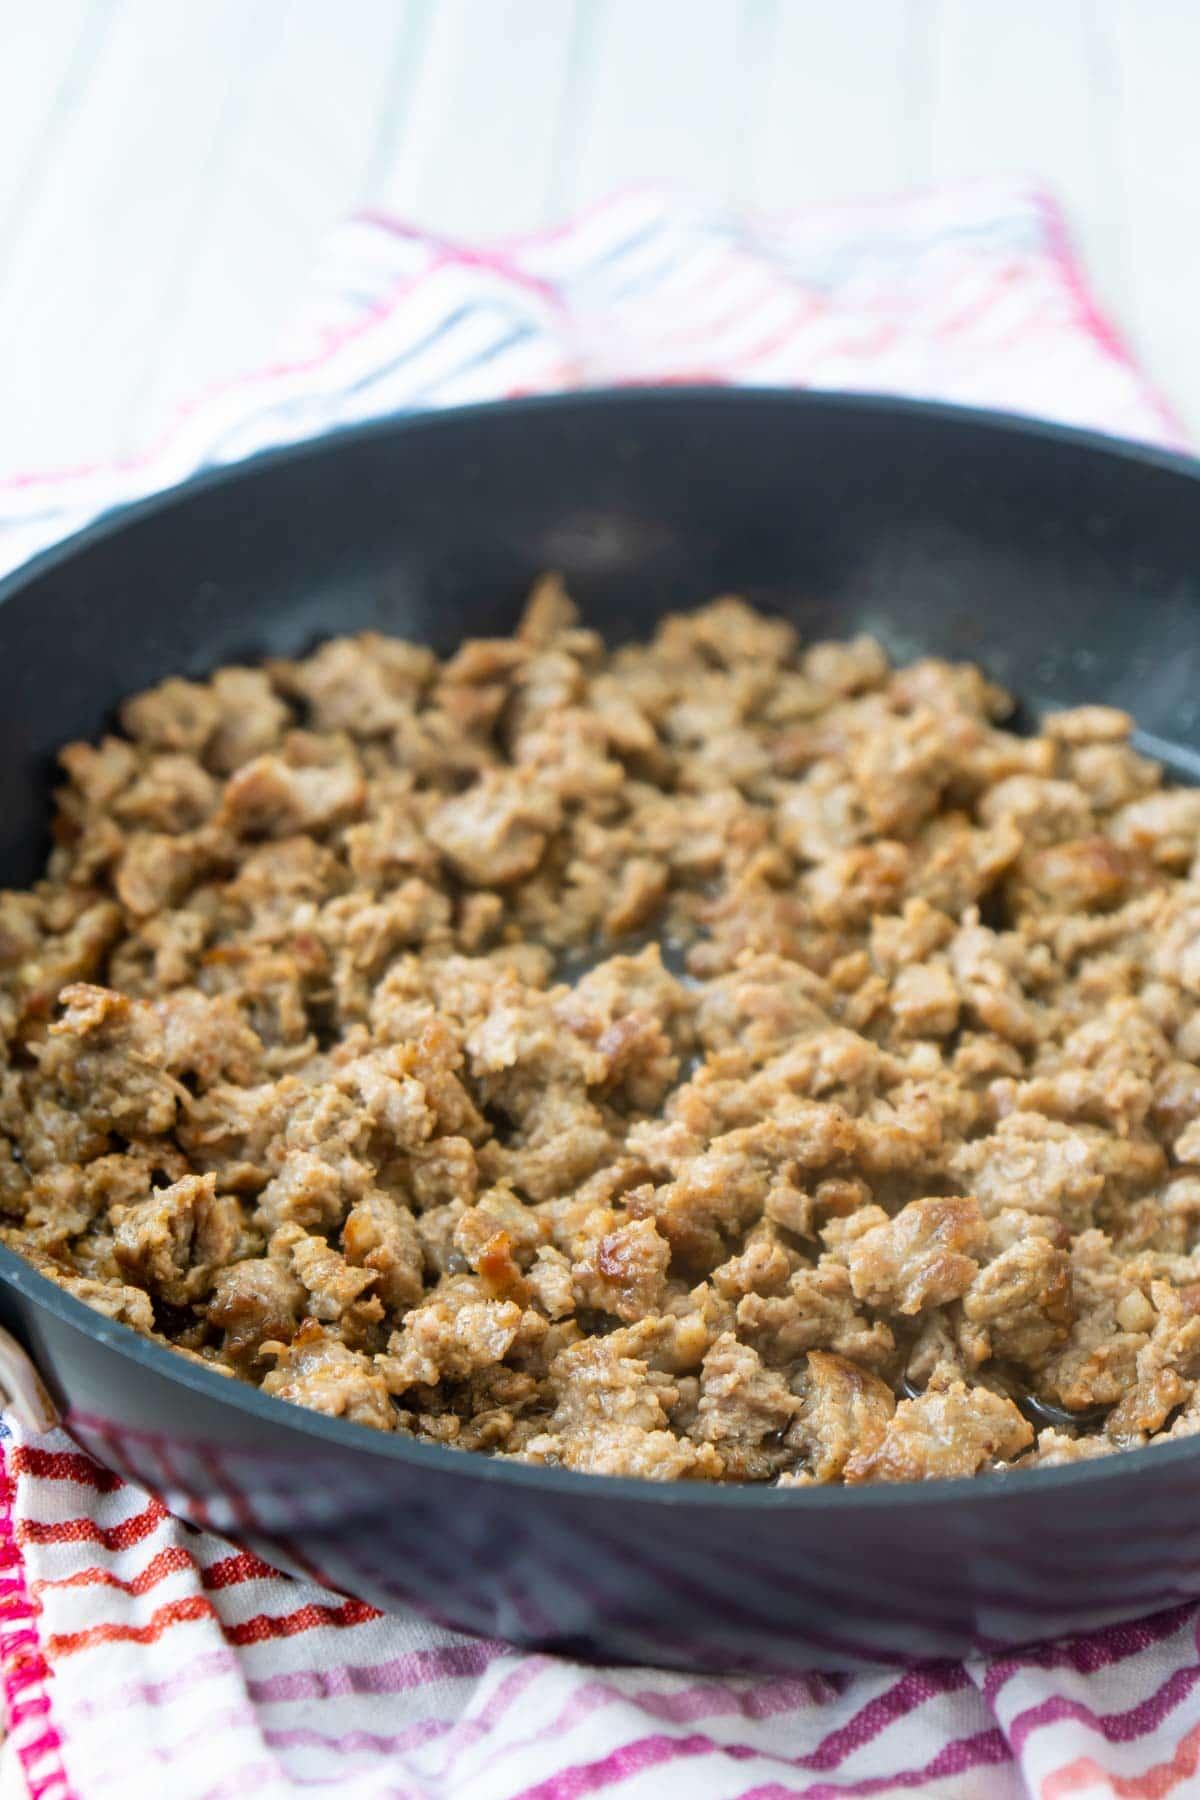 browned breakfast sausage in a pan